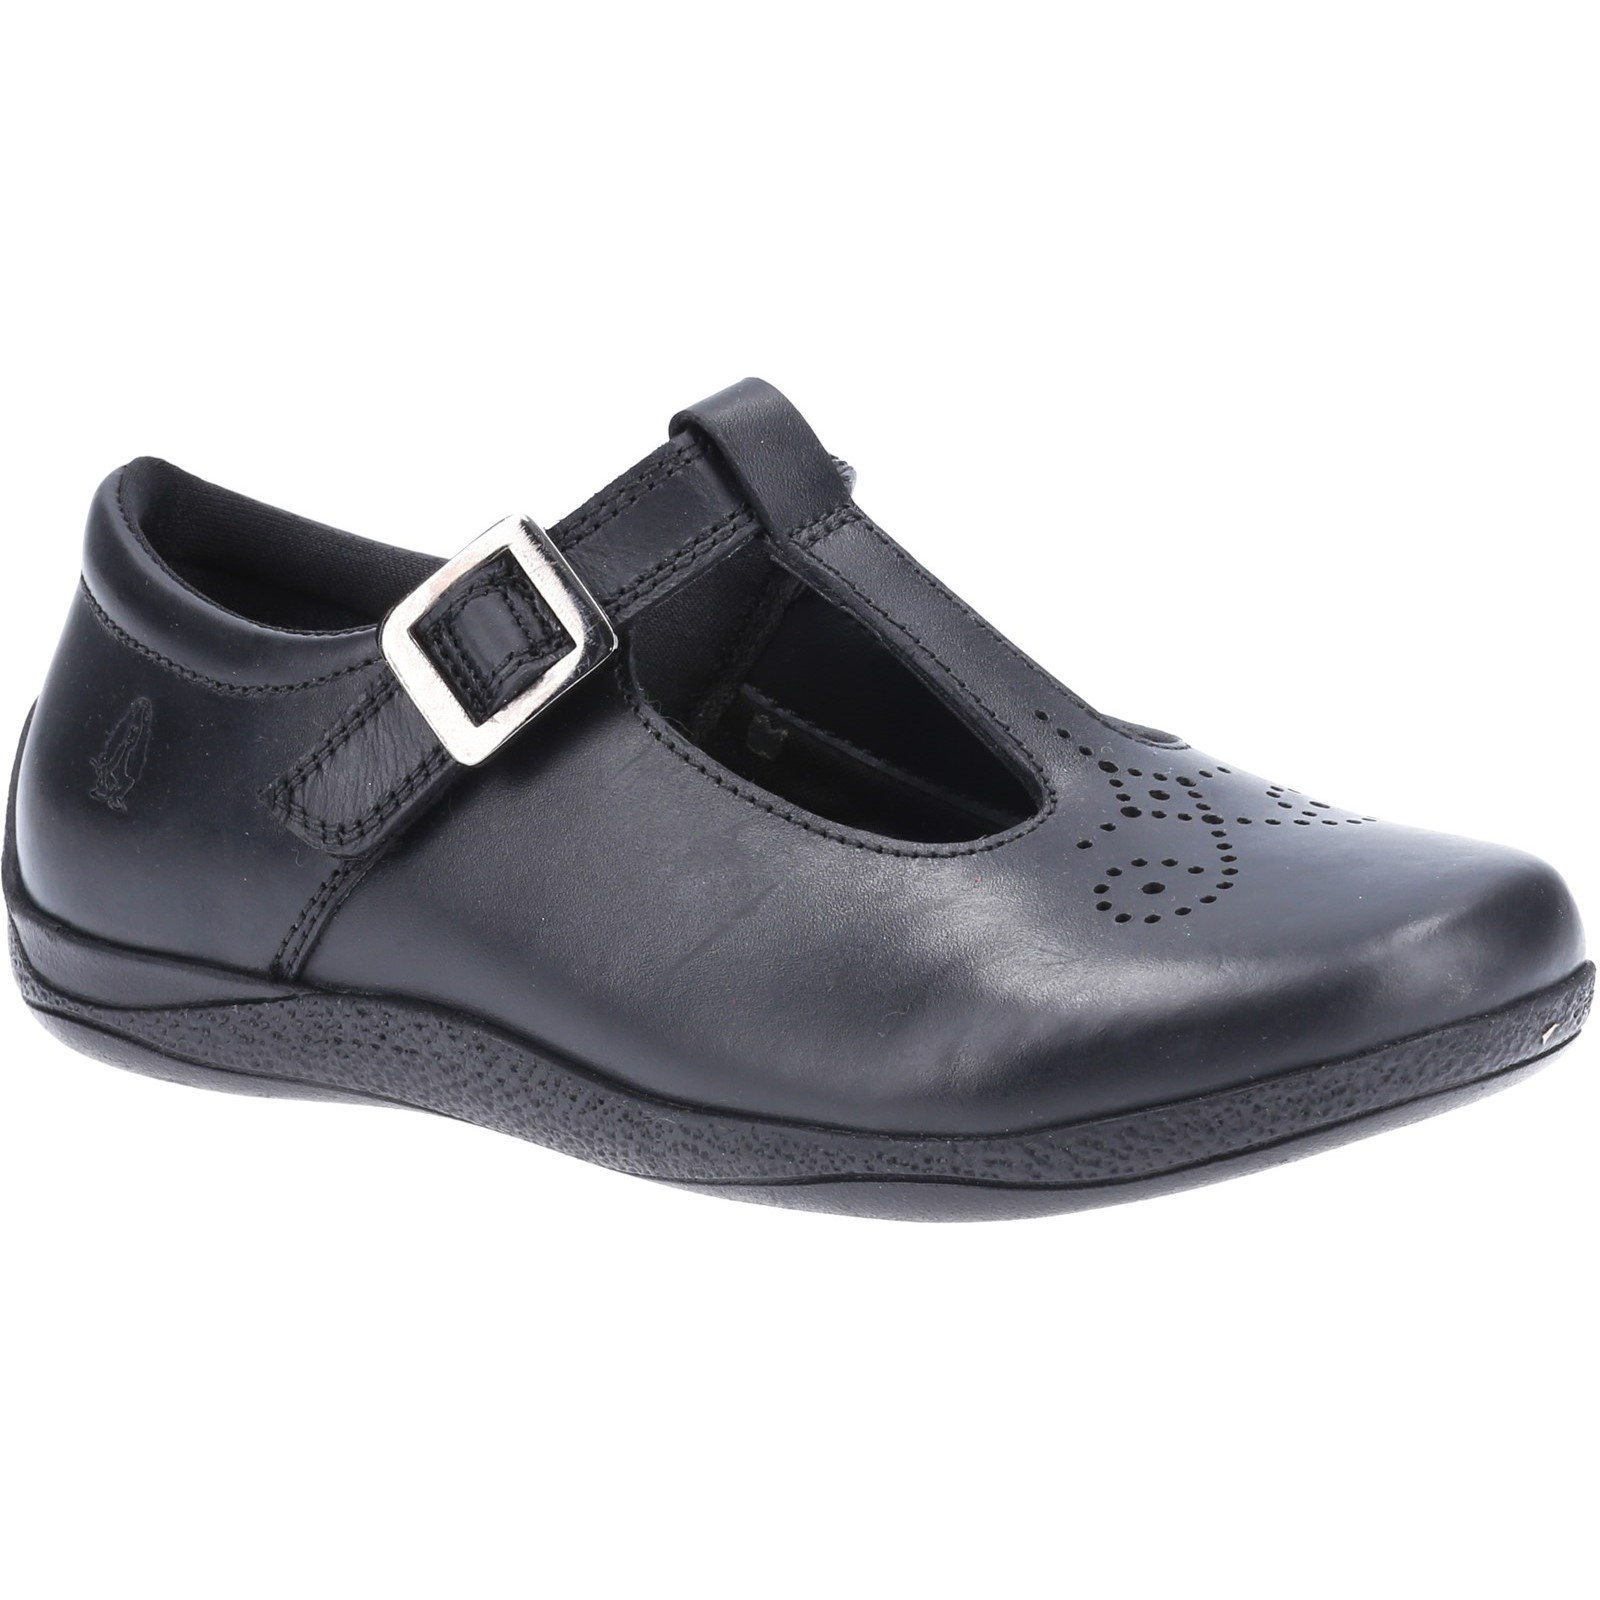 Hush Puppies Kid's Eliza Junior School Shoe Black 32589 - Black 2